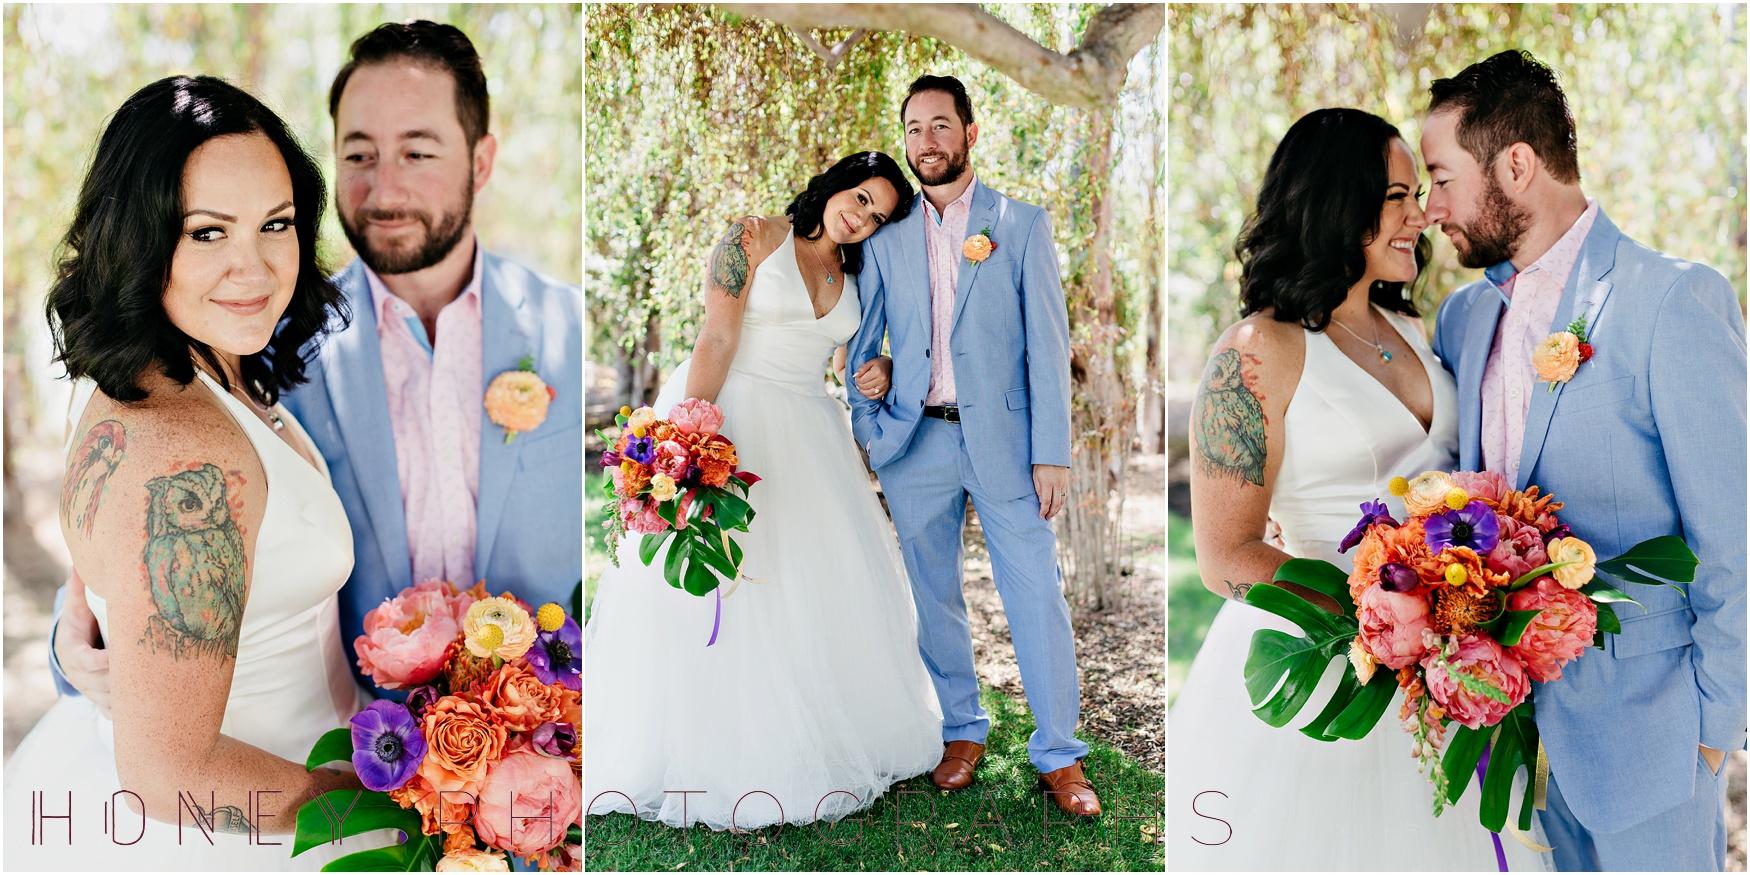 colorful_ecclectic_vibrant_vista_rainbow_quirky_wedding033.jpg